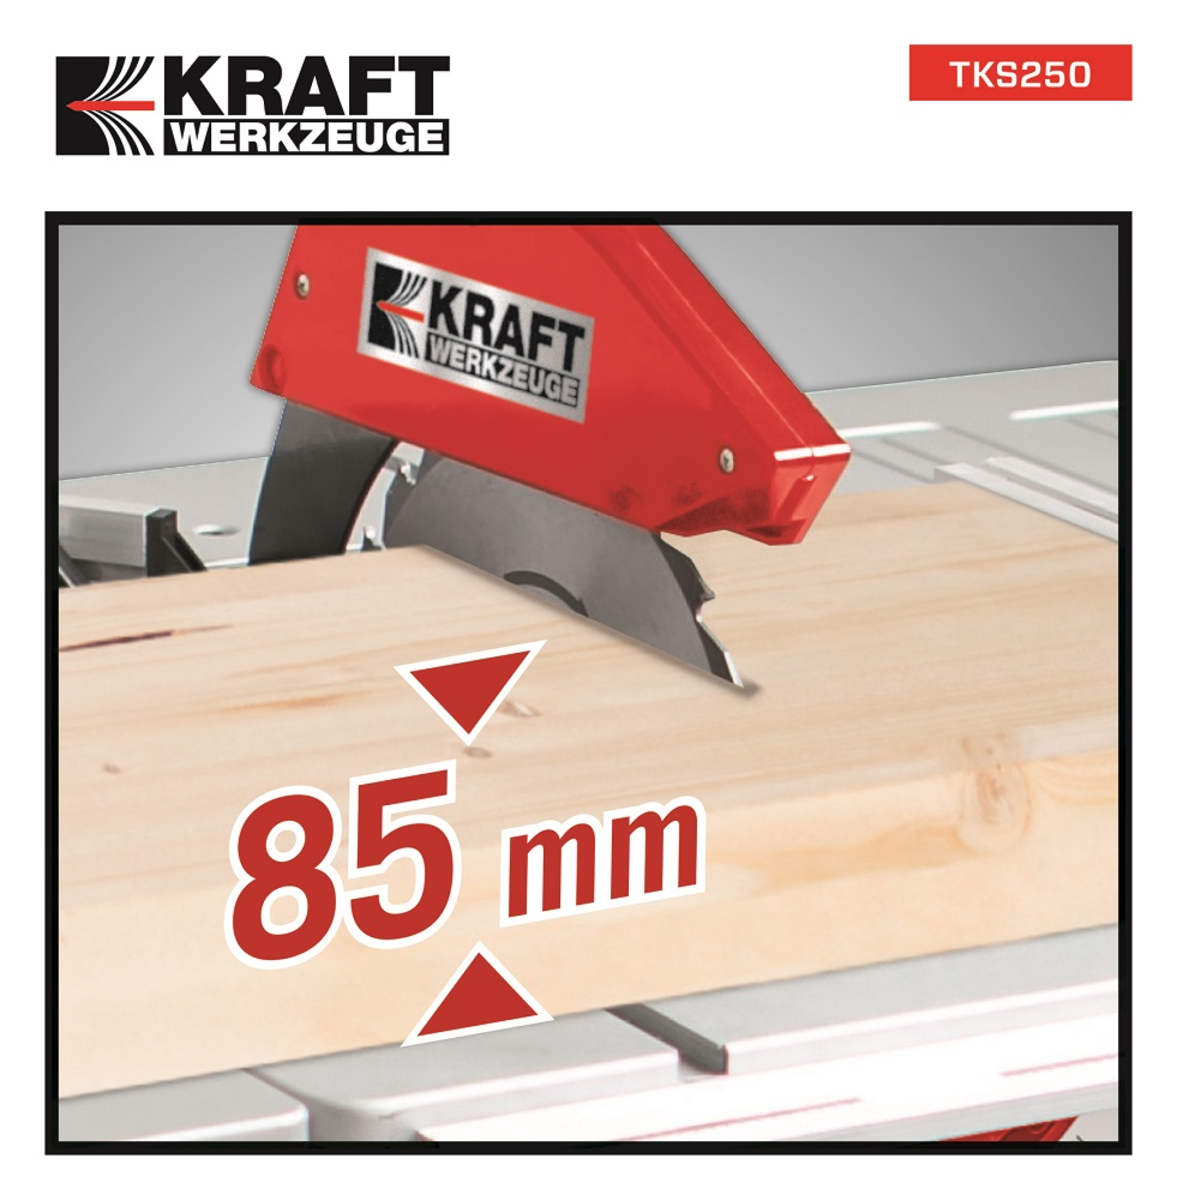 Bild 5 von Kraft Werkzeuge Tischkreissäge TKS250 inkl. 2. Sägeblatt